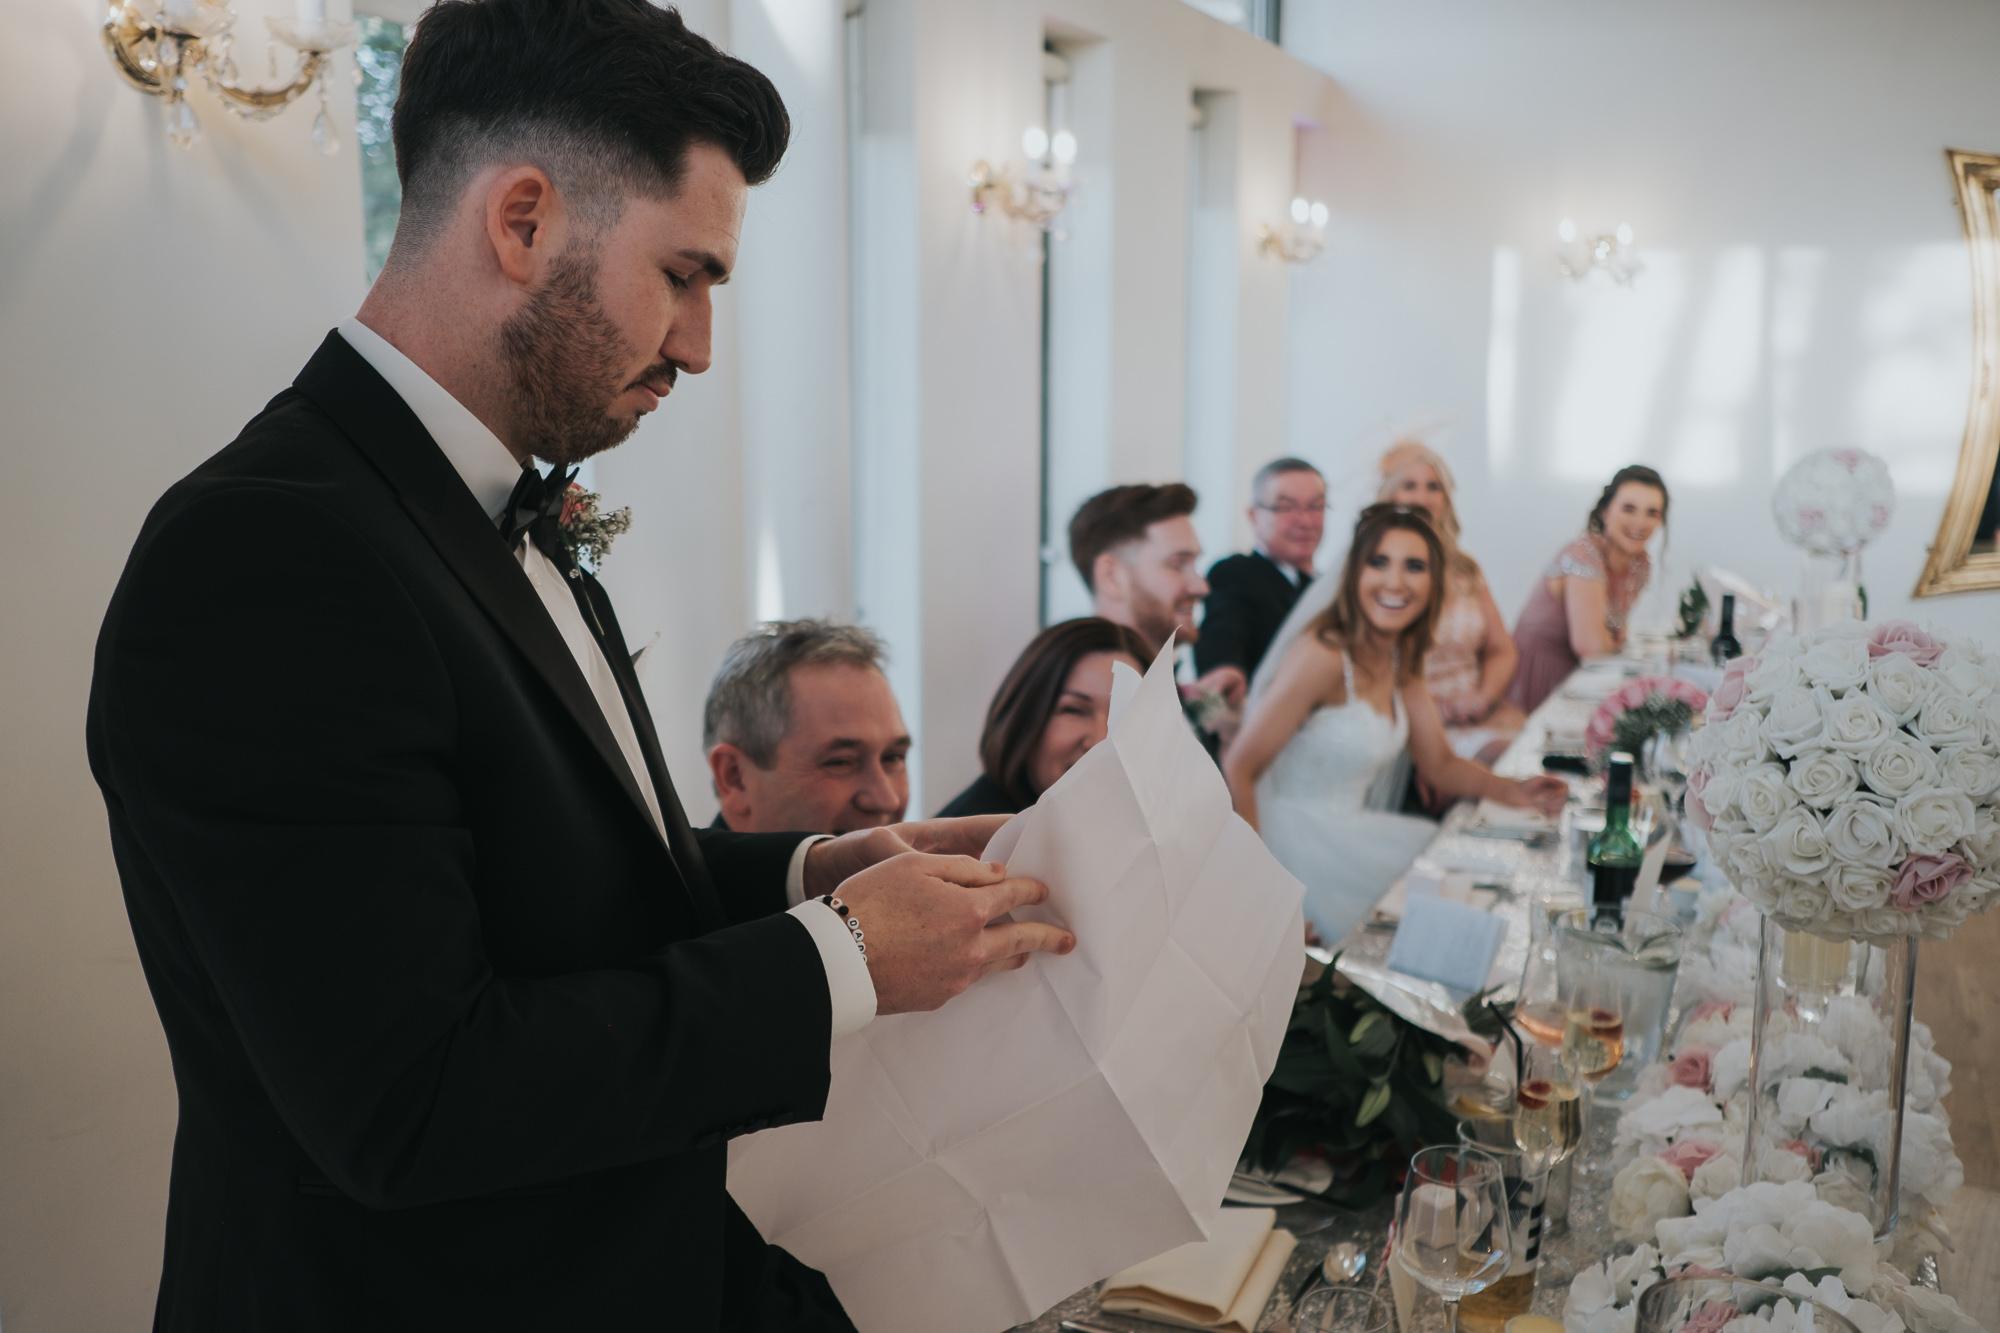 West Tower Exclusive Wedding Venue wedding photography merseyside and lancashire wedding photographer (49 of 60).jpg